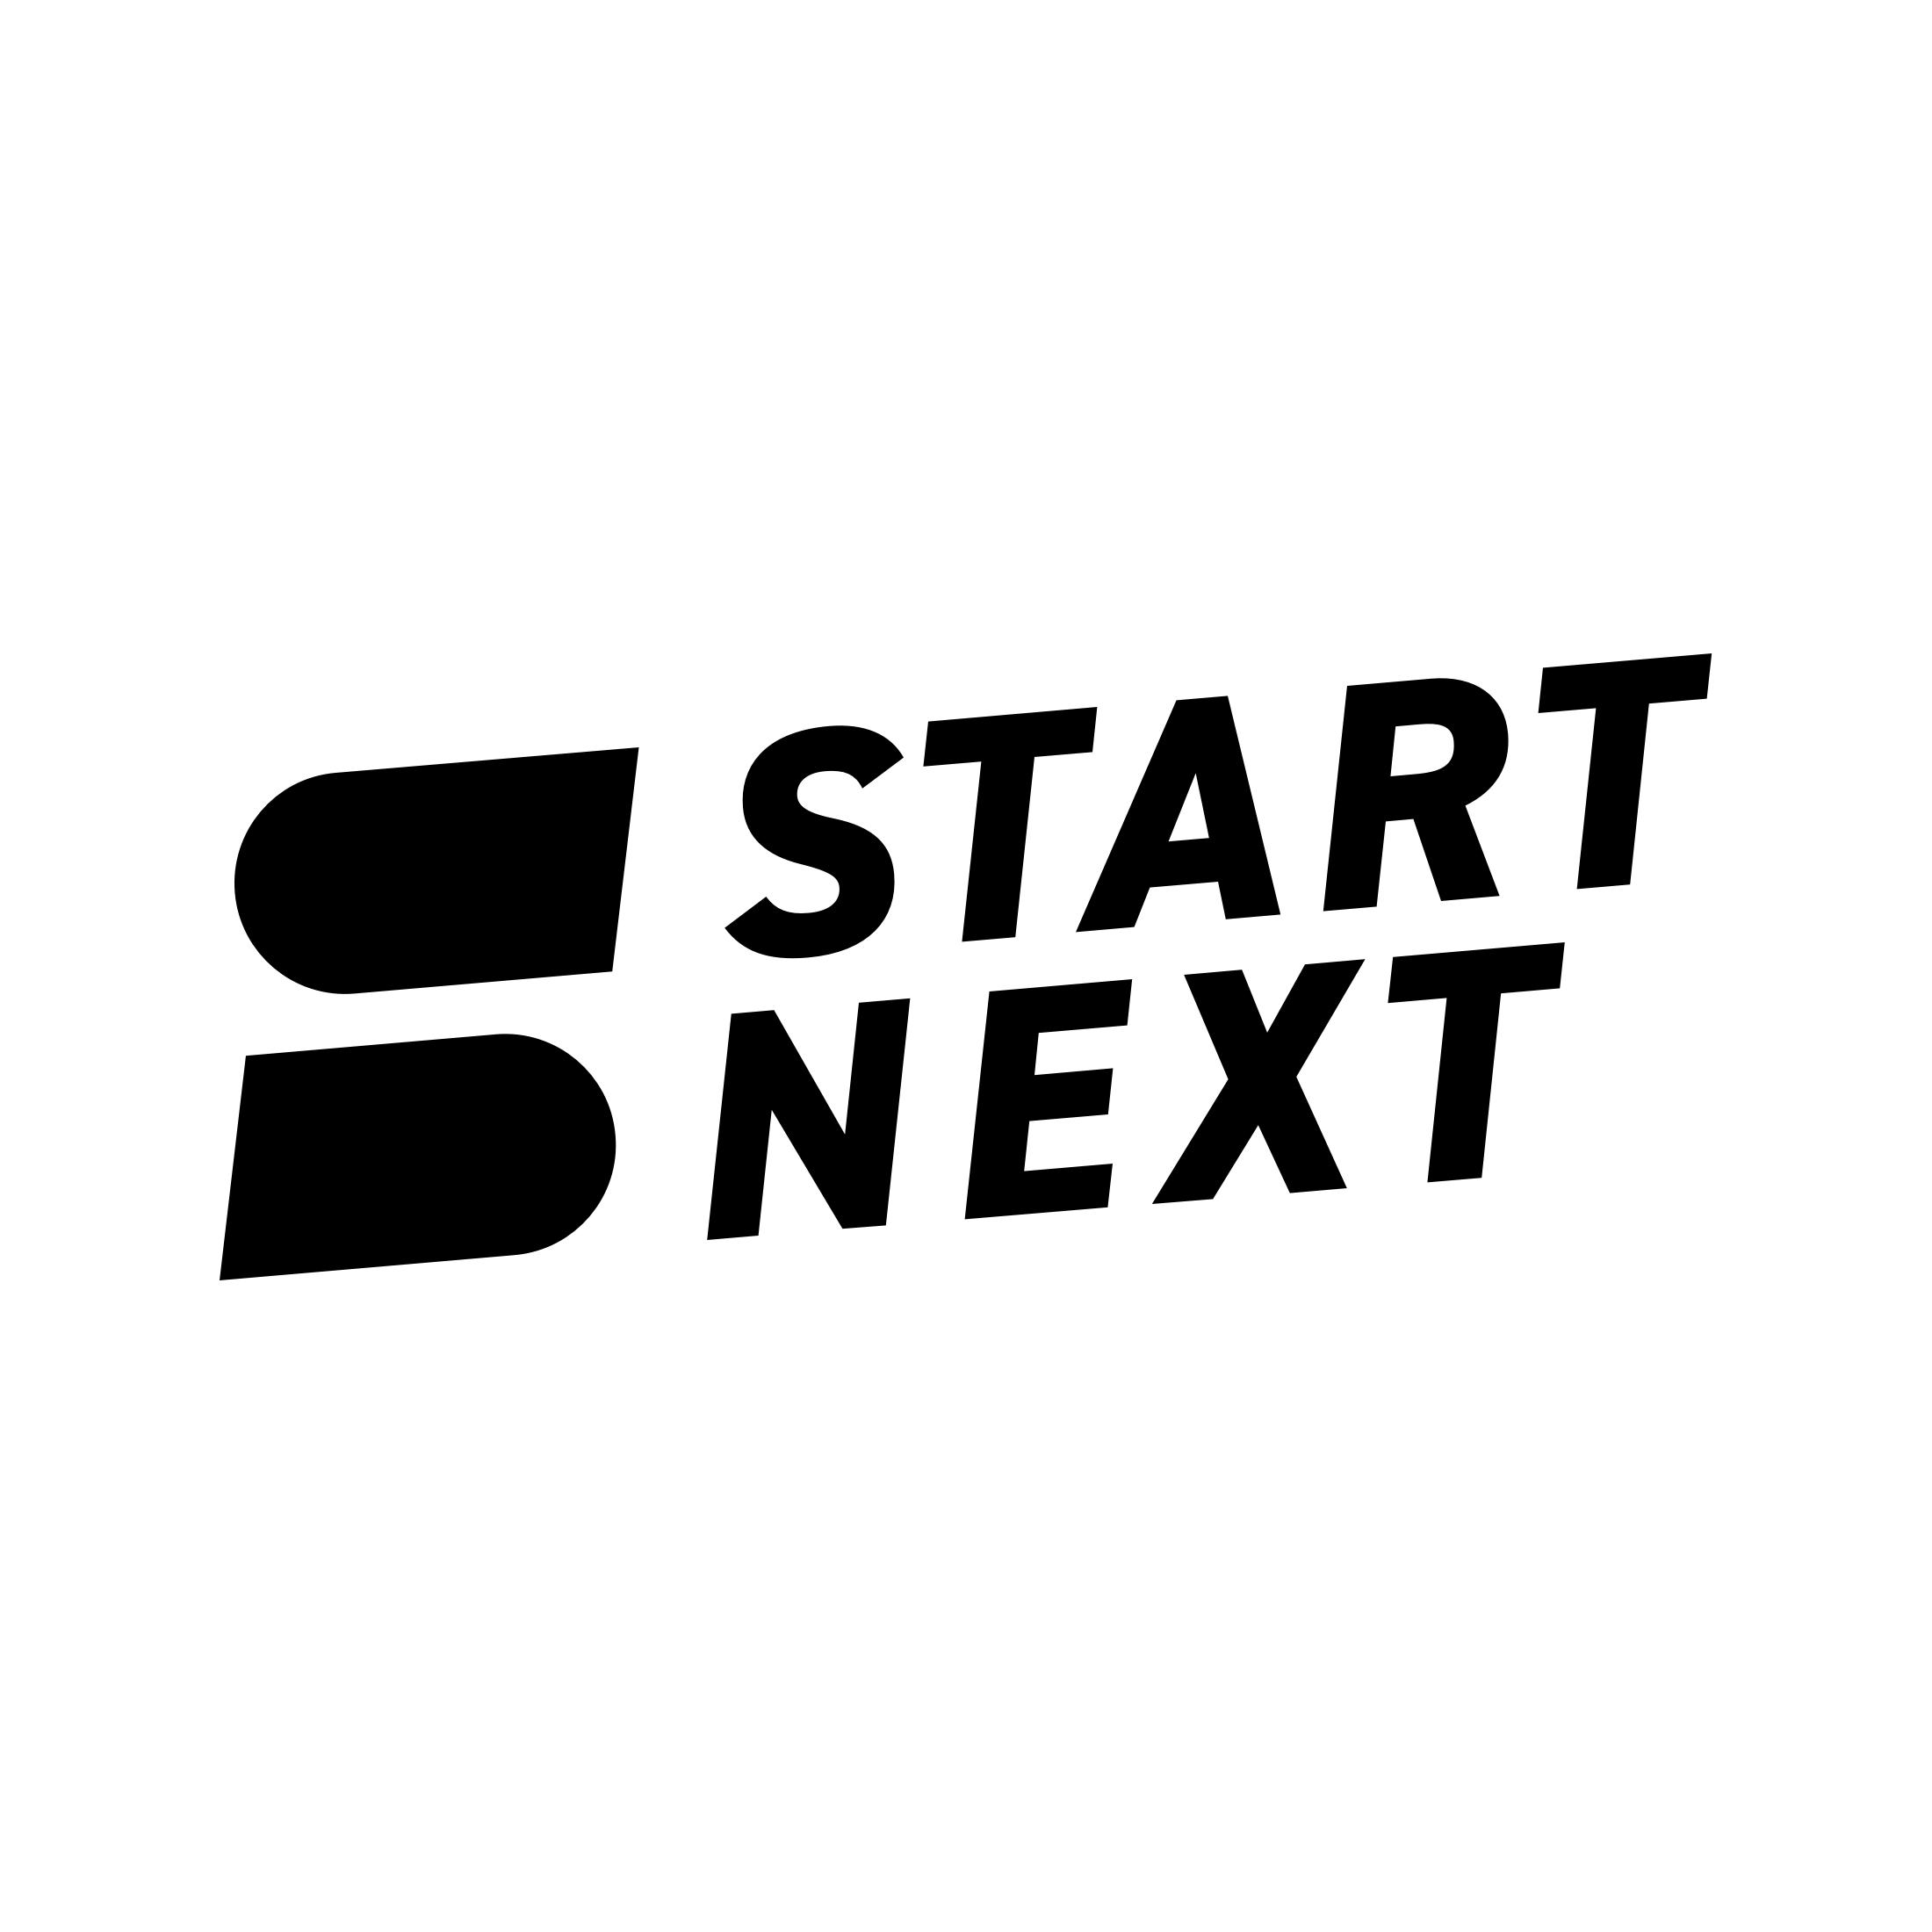 Startnex